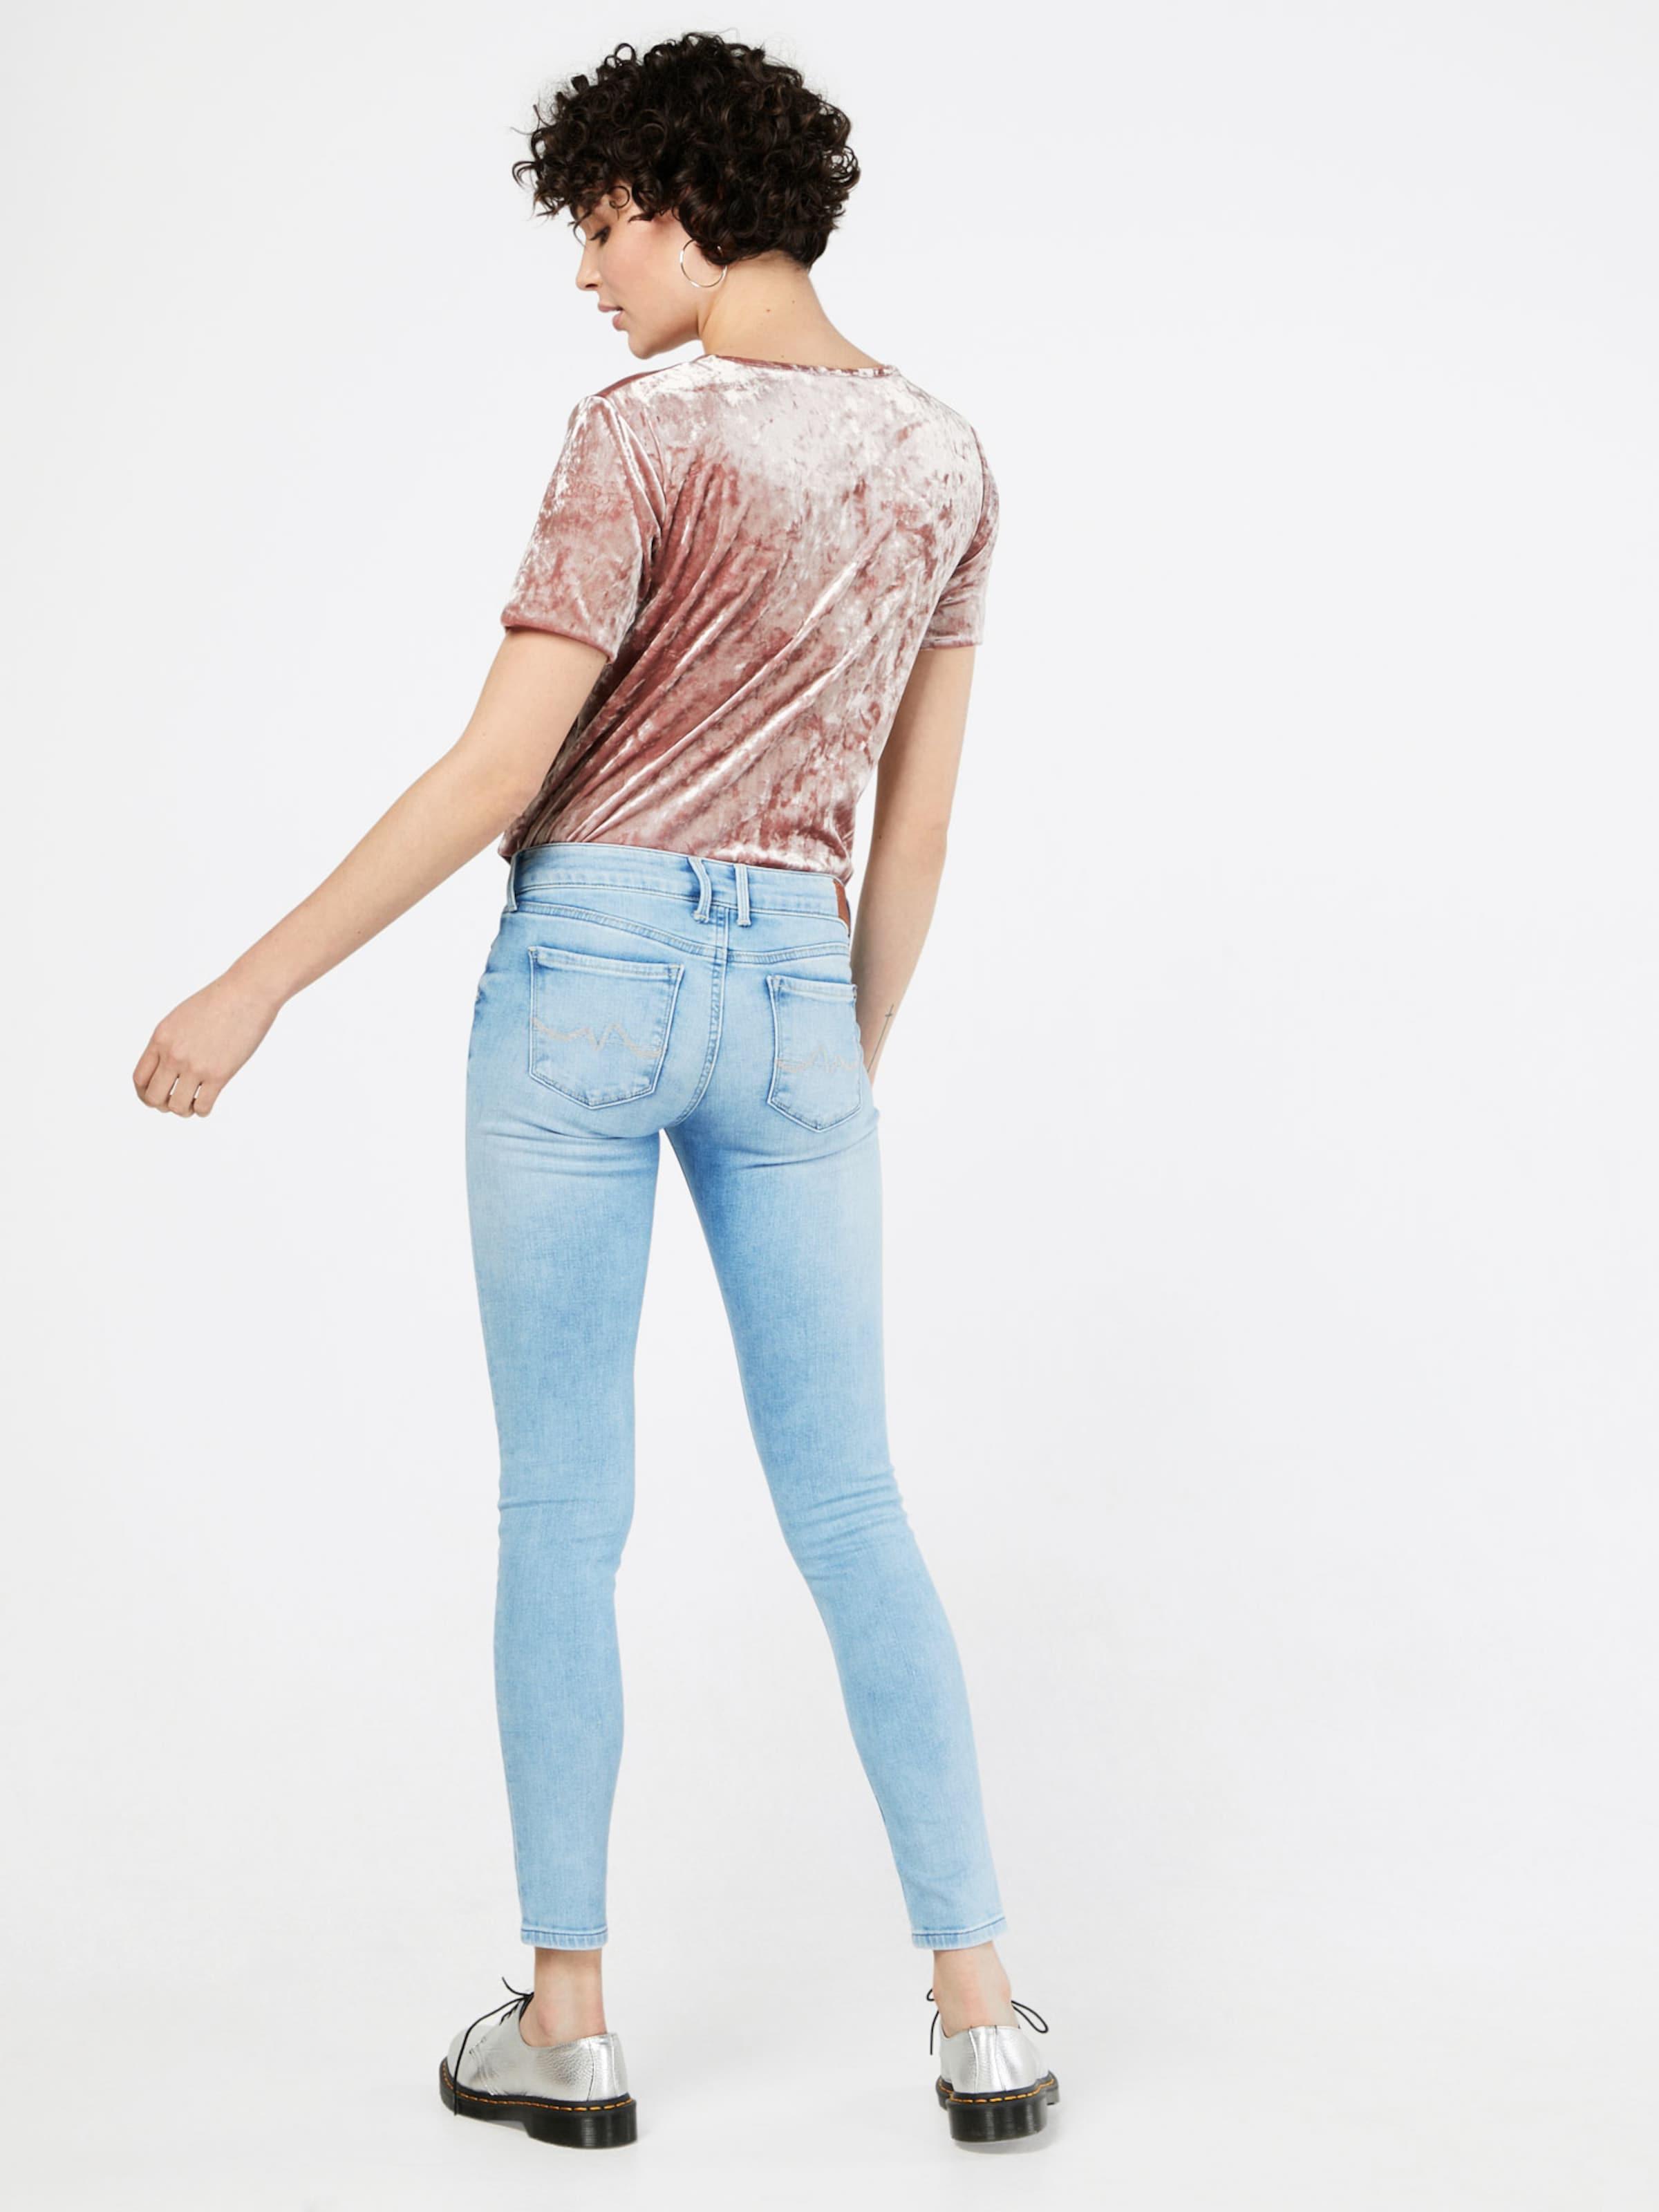 Pepe Jeans 'soho' In Lichtblauw Pepe In Jeans Lichtblauw 'soho' wXTuPkZiO